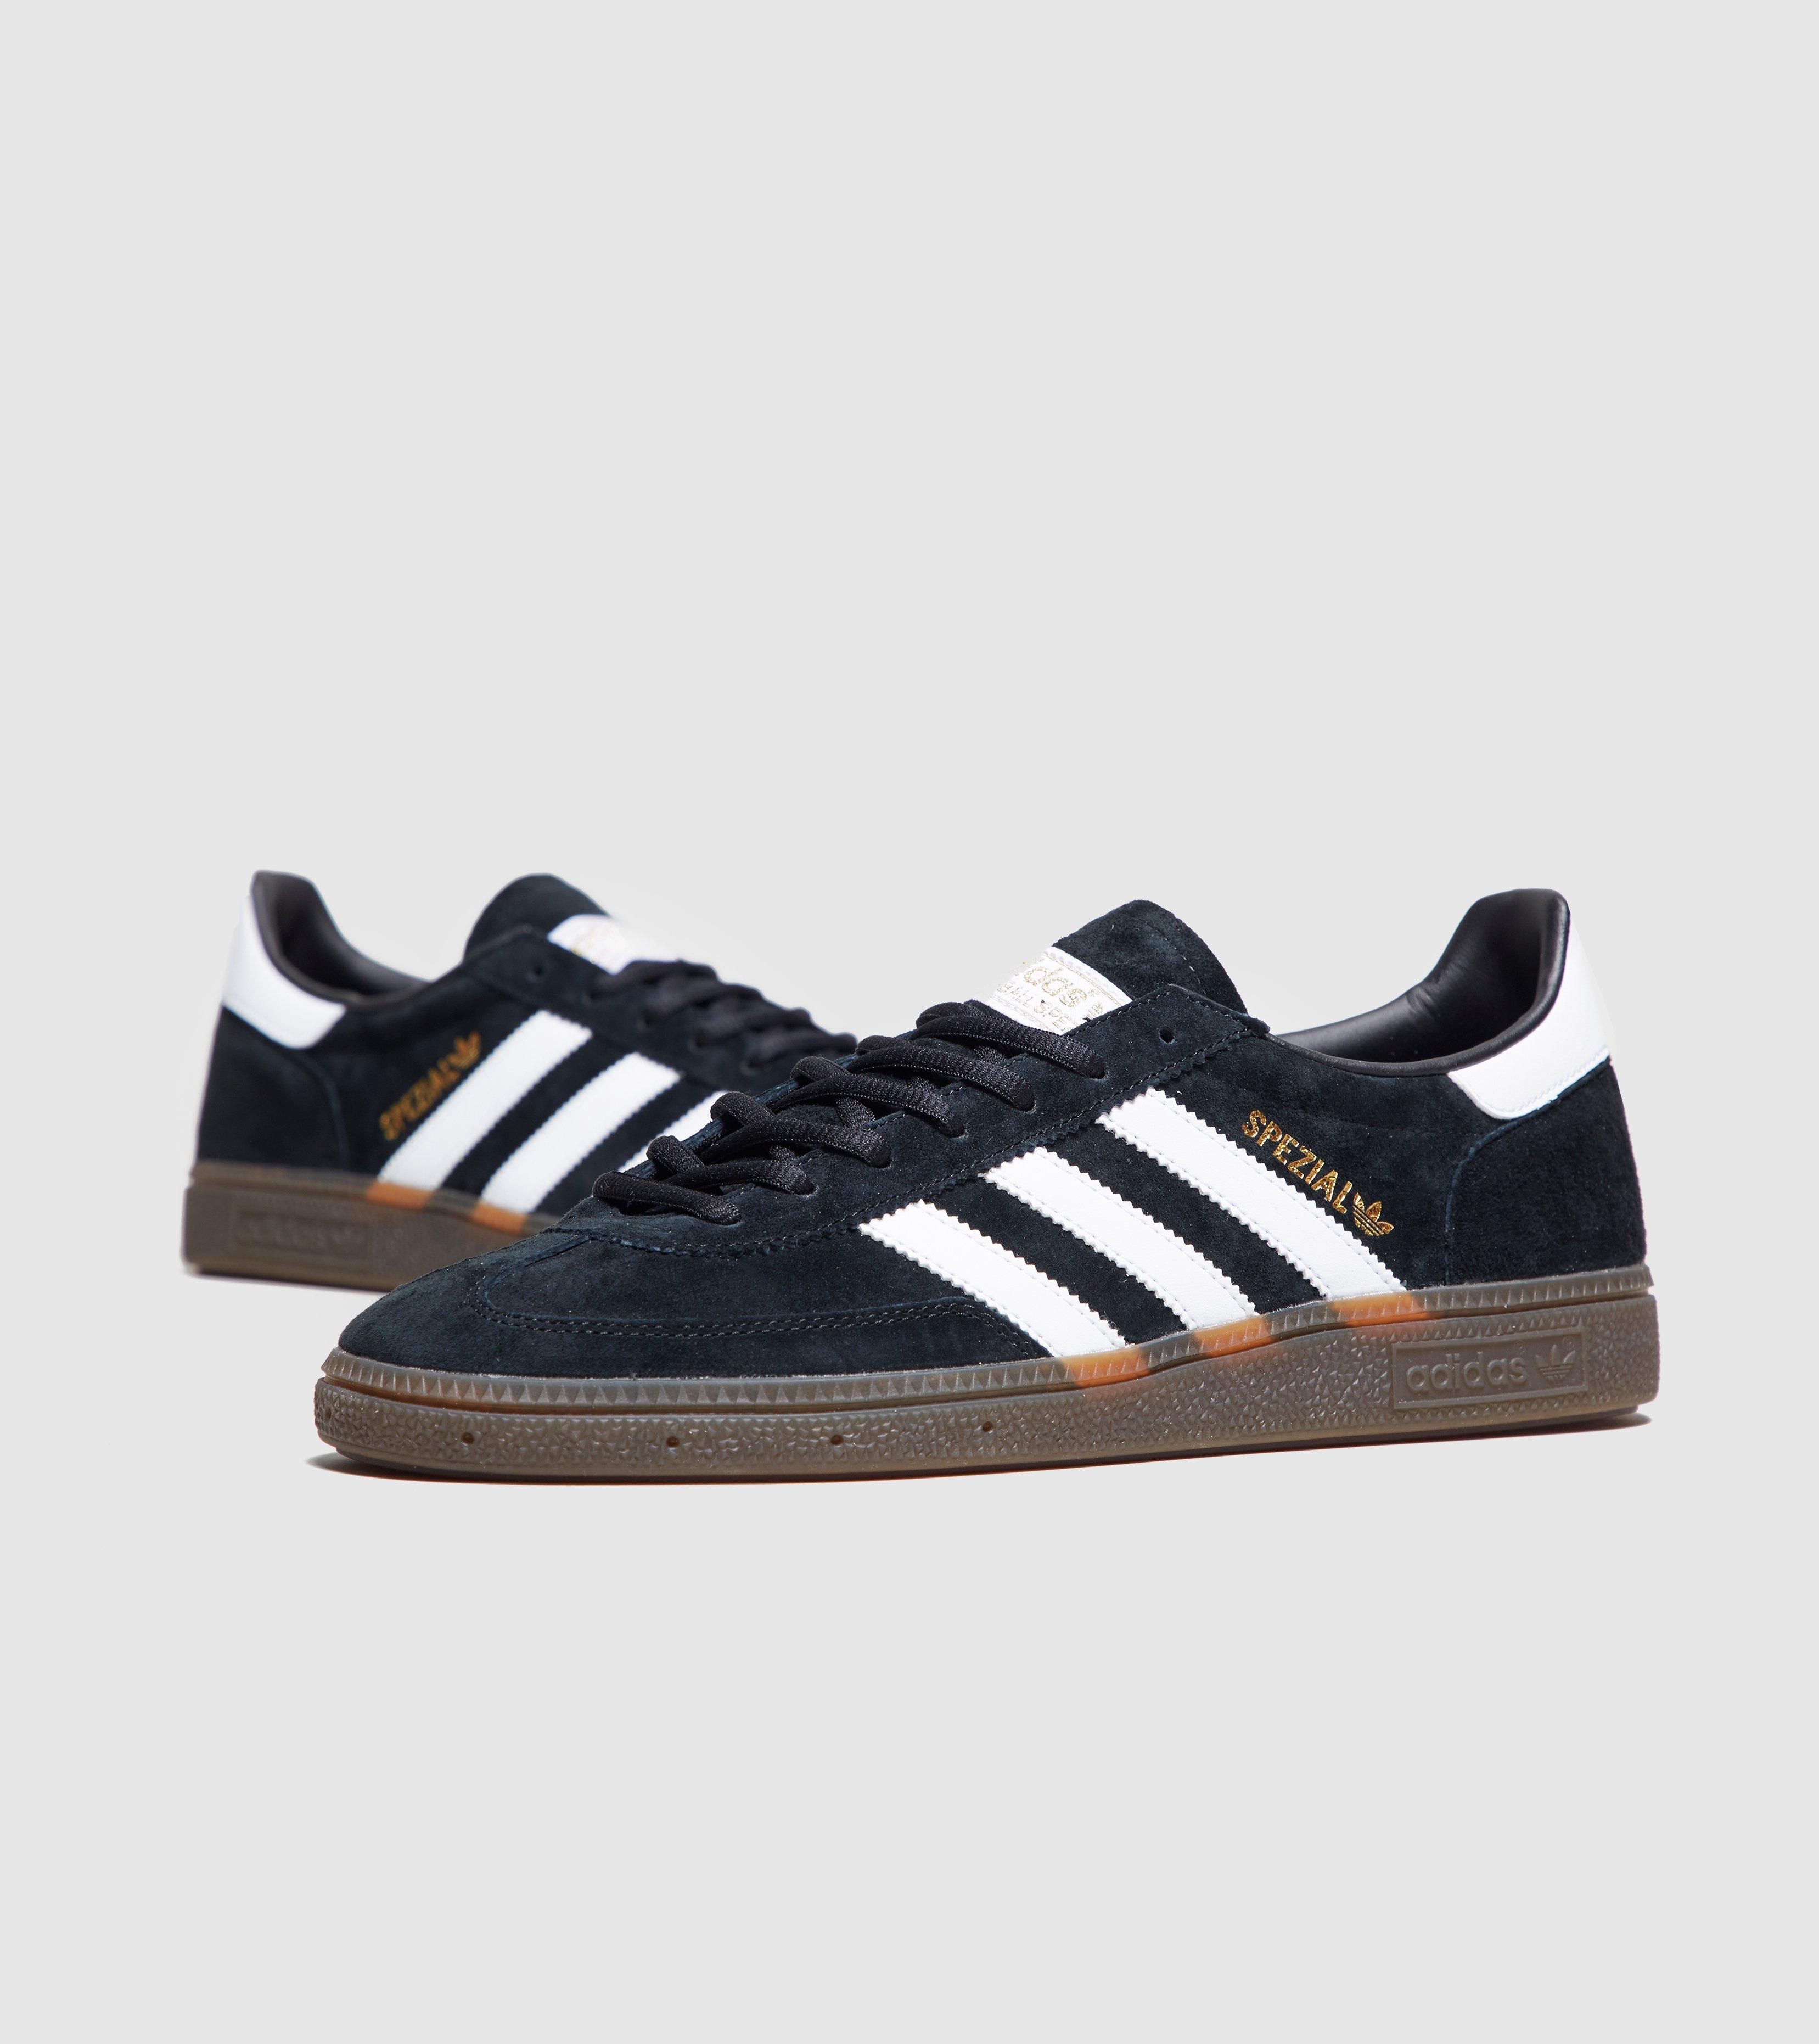 0166335b5663 Adidas Originals - Black Handball Spezial for Men - Lyst. View fullscreen